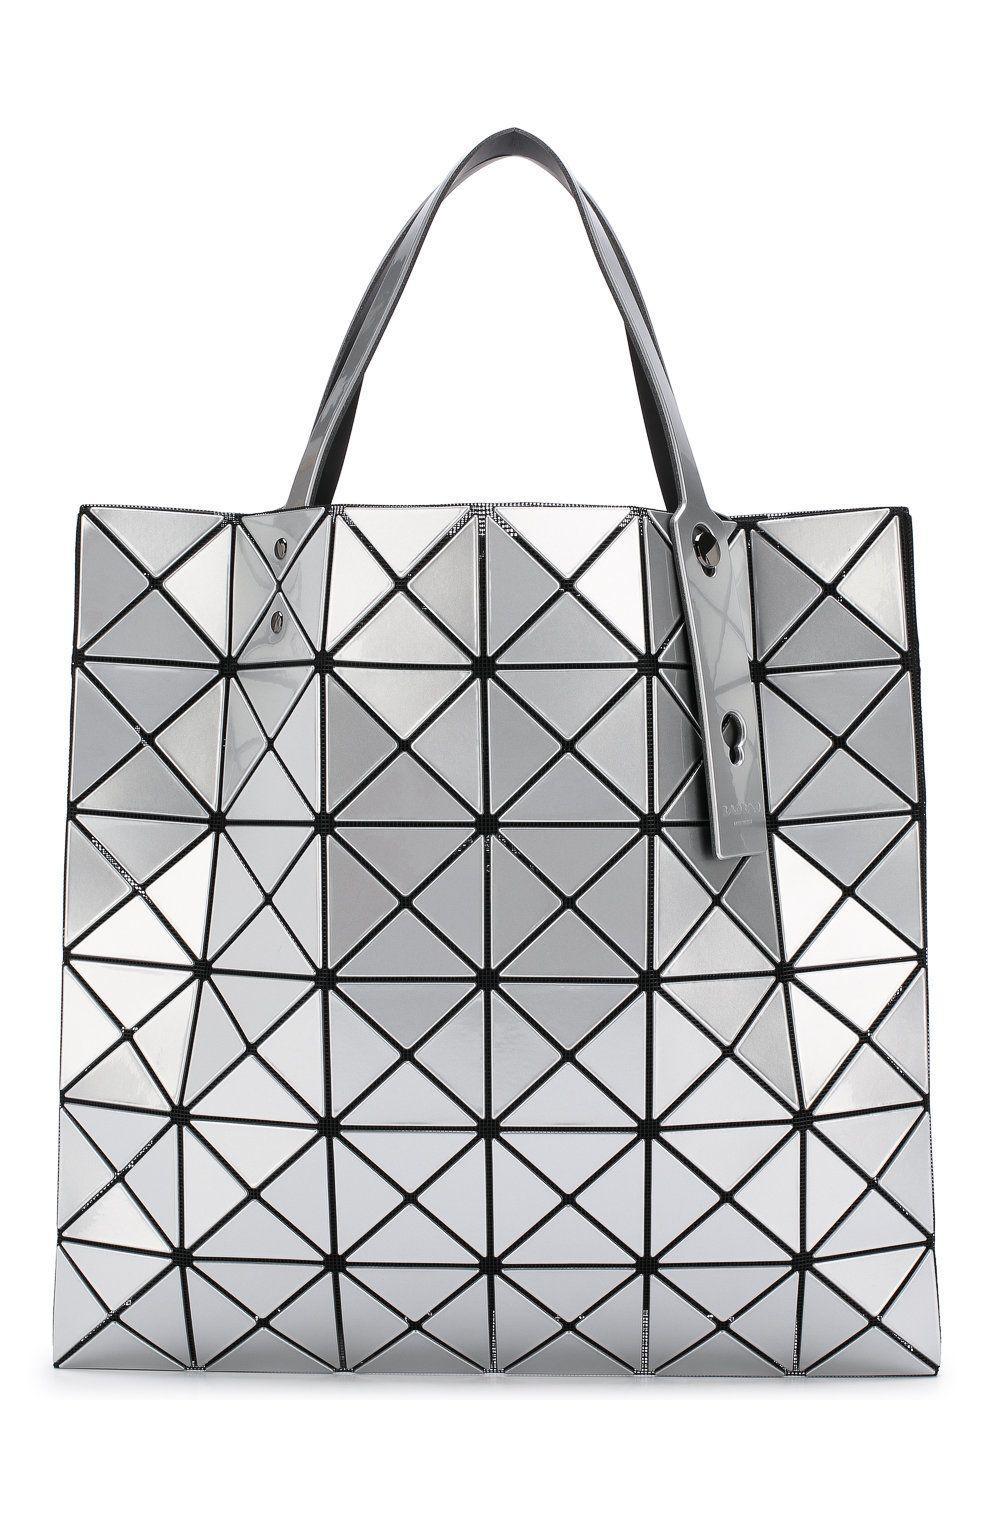 d4212039e93e Женская сумка-тоут prism BAO BAO ISSEY MIYAKE серебряного цвета